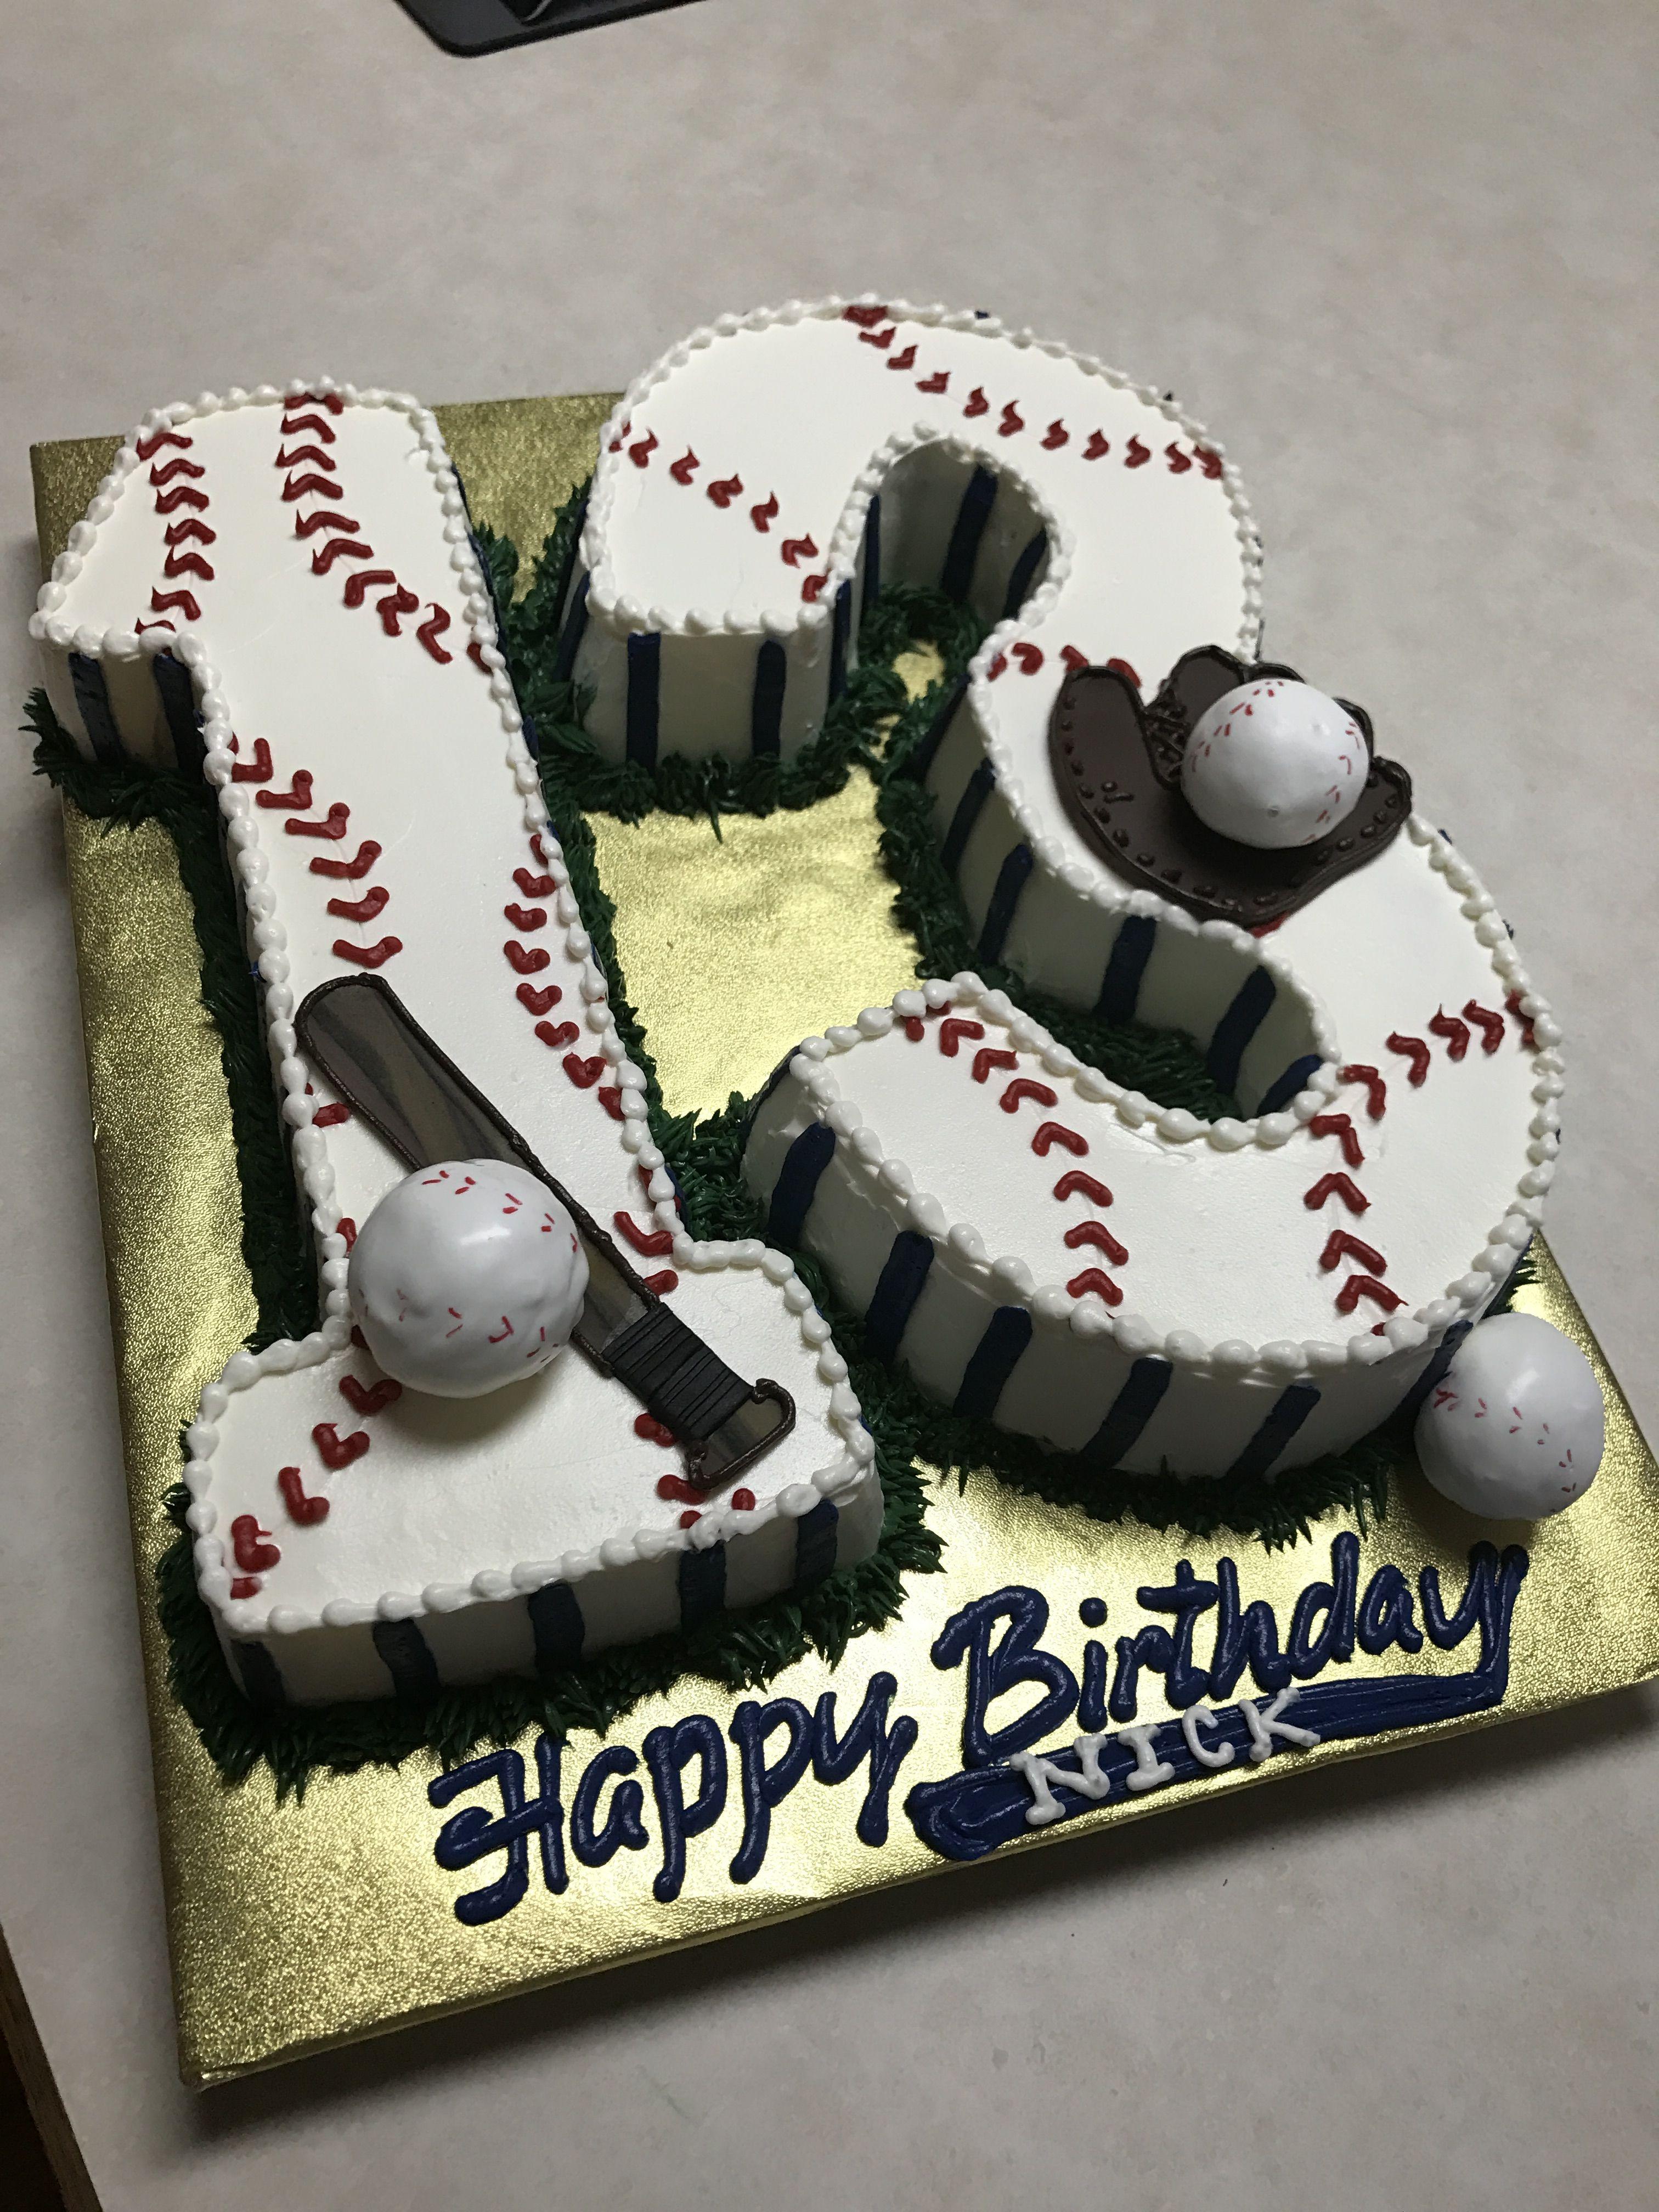 Astonishing Baseball Number Cake With Baseball Cake Pops Baseball Birthday Birthday Cards Printable Inklcafe Filternl